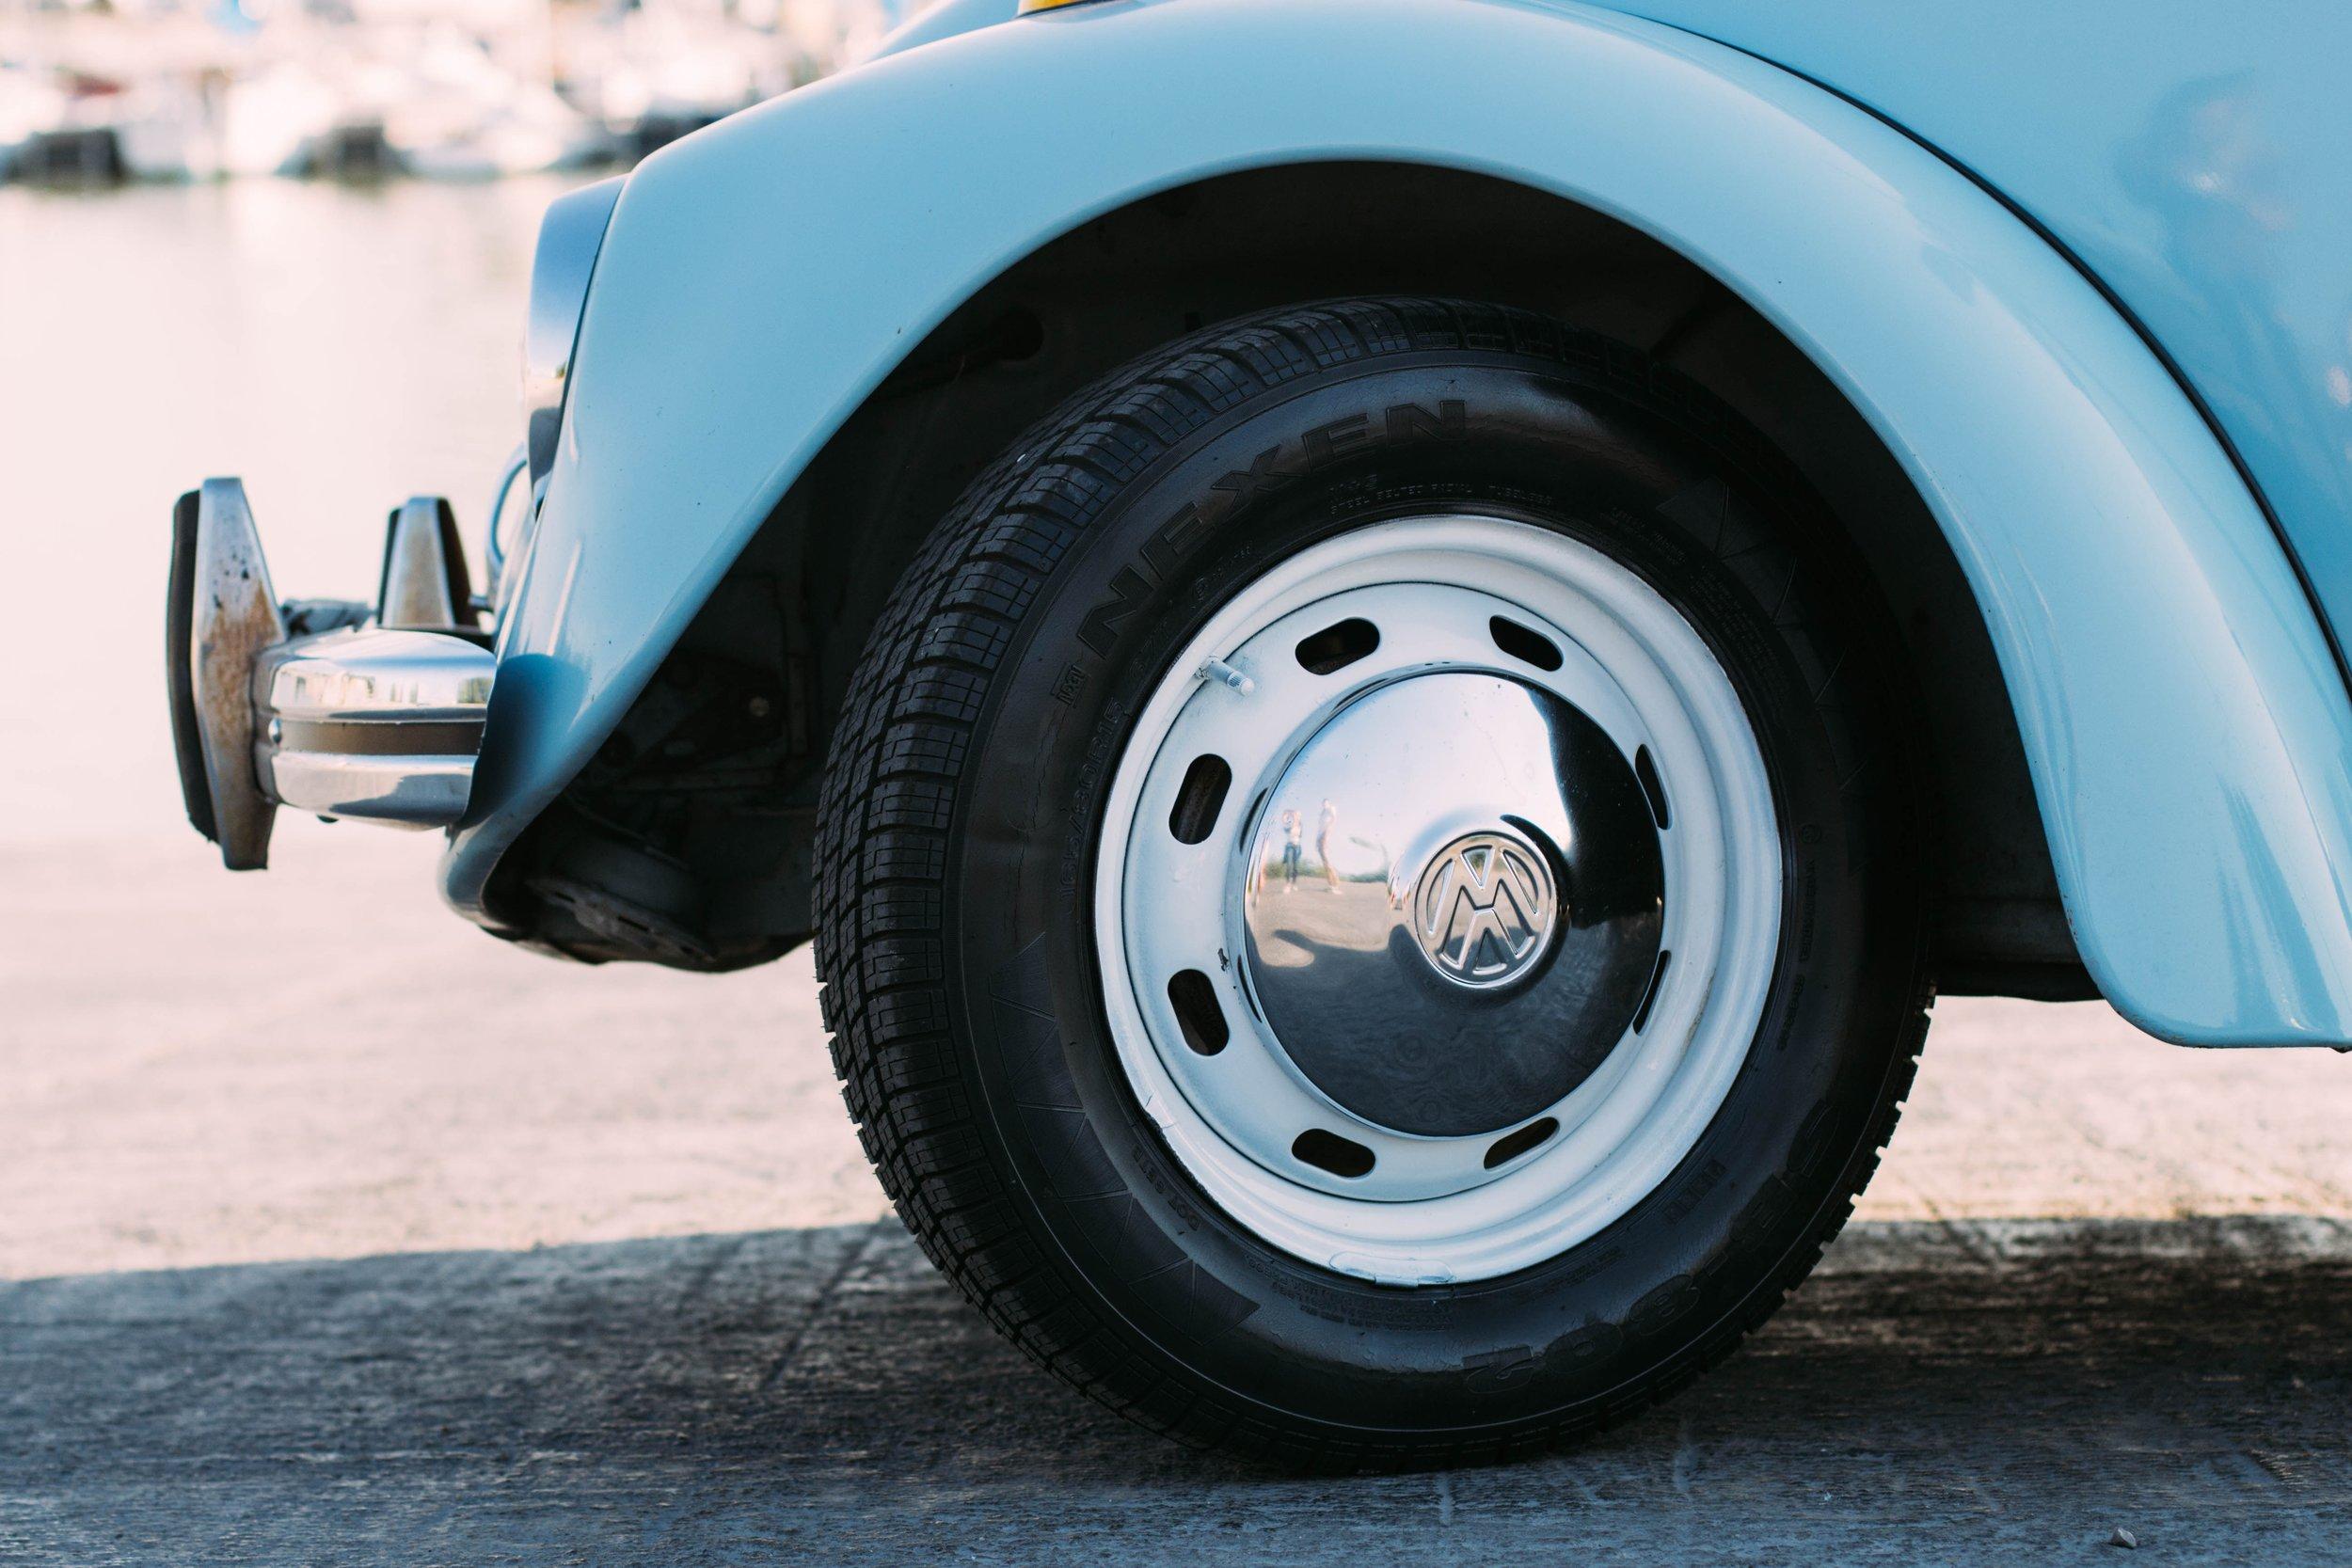 The 10 Best Tire Inflators